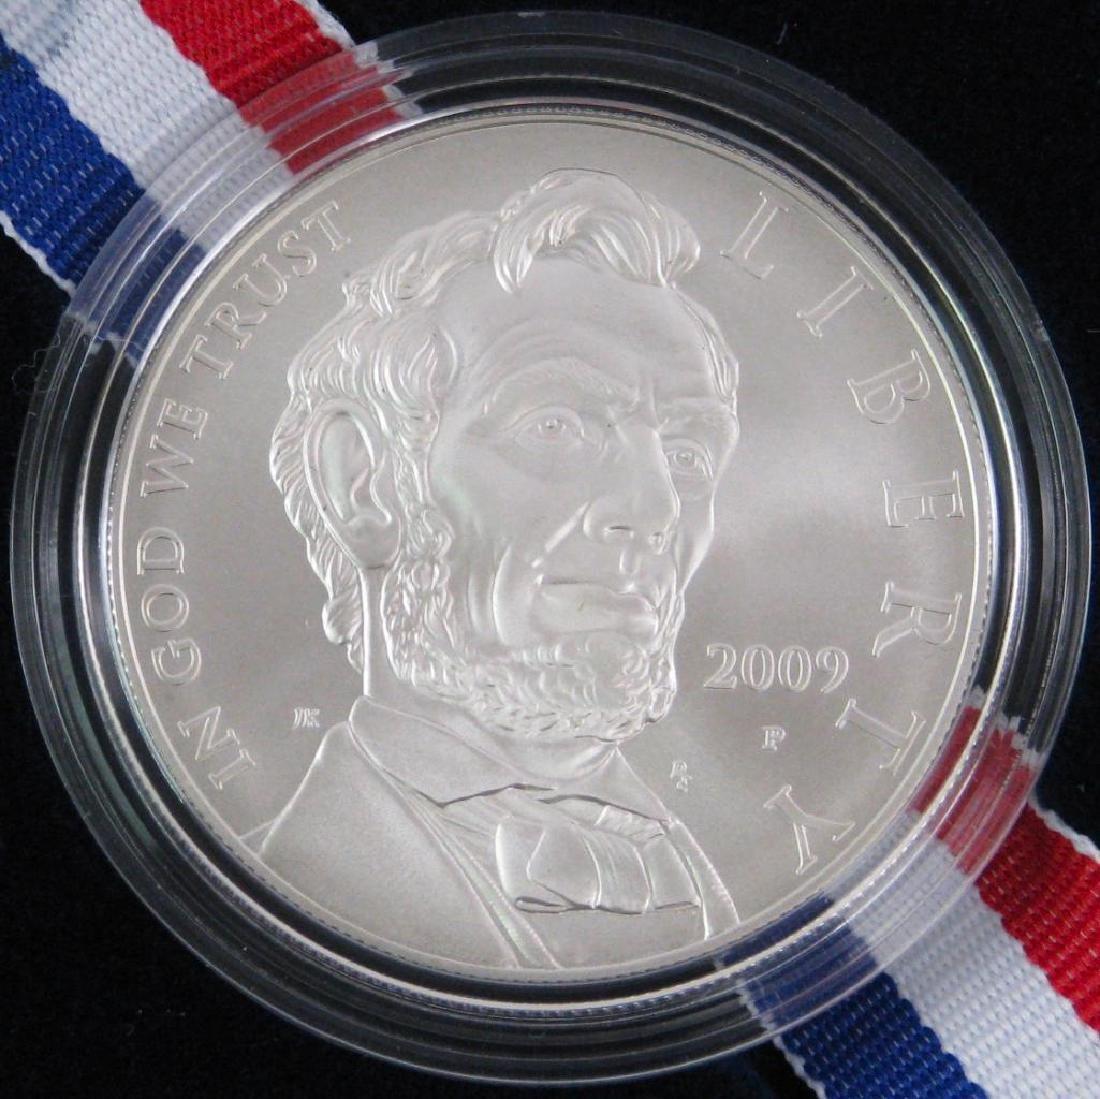 Lot of 2 : 2009-P Lincoln Commemorative Silver Dollars - 4